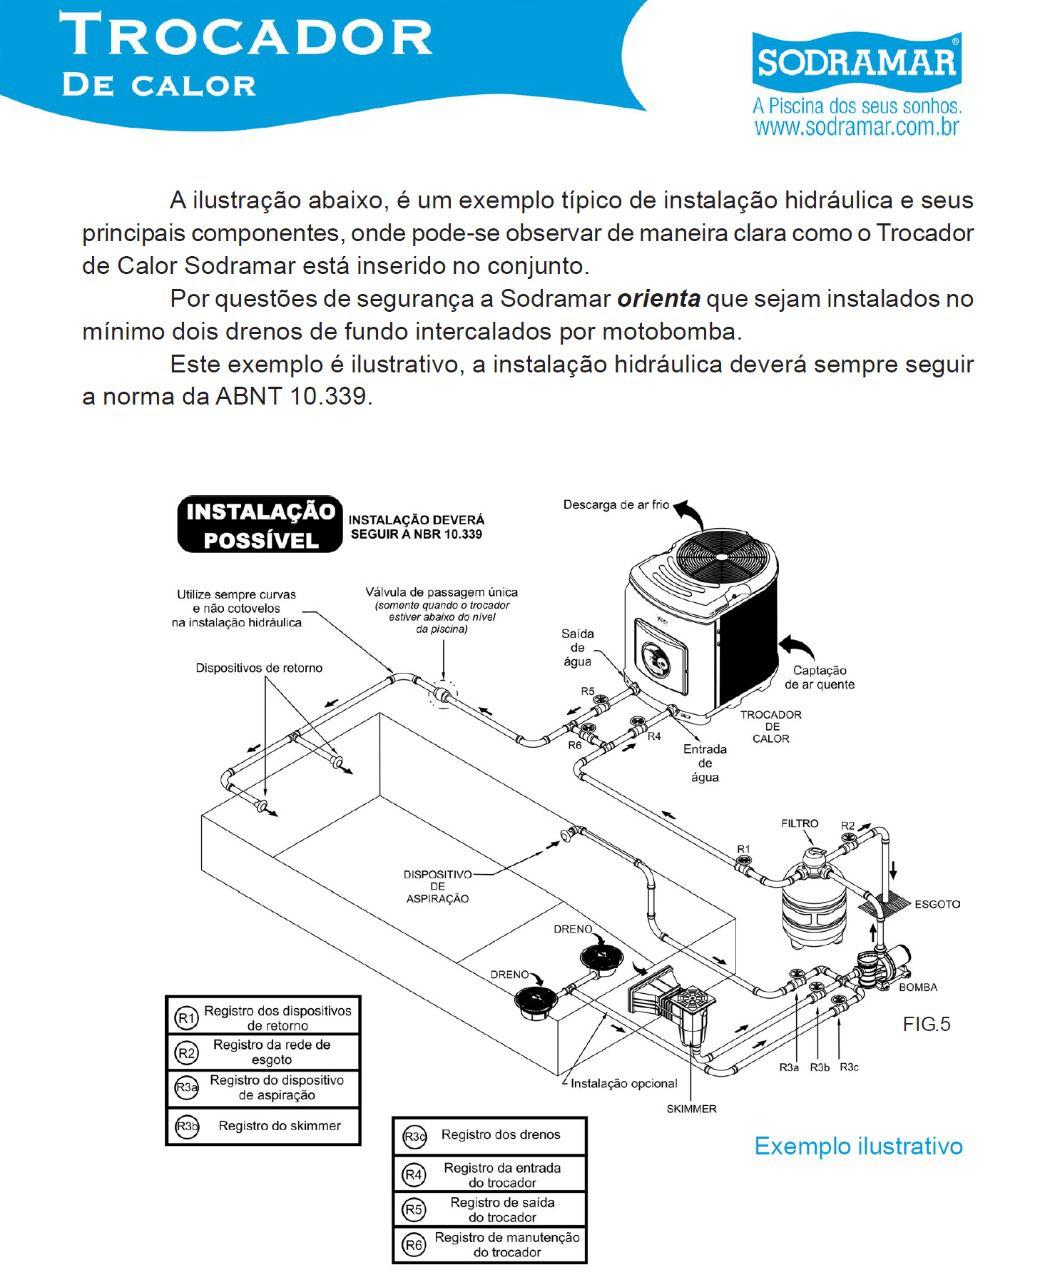 Aquecedor de piscina Sodramar Yes - Trocador de Calor Sd-130 Trif 380V